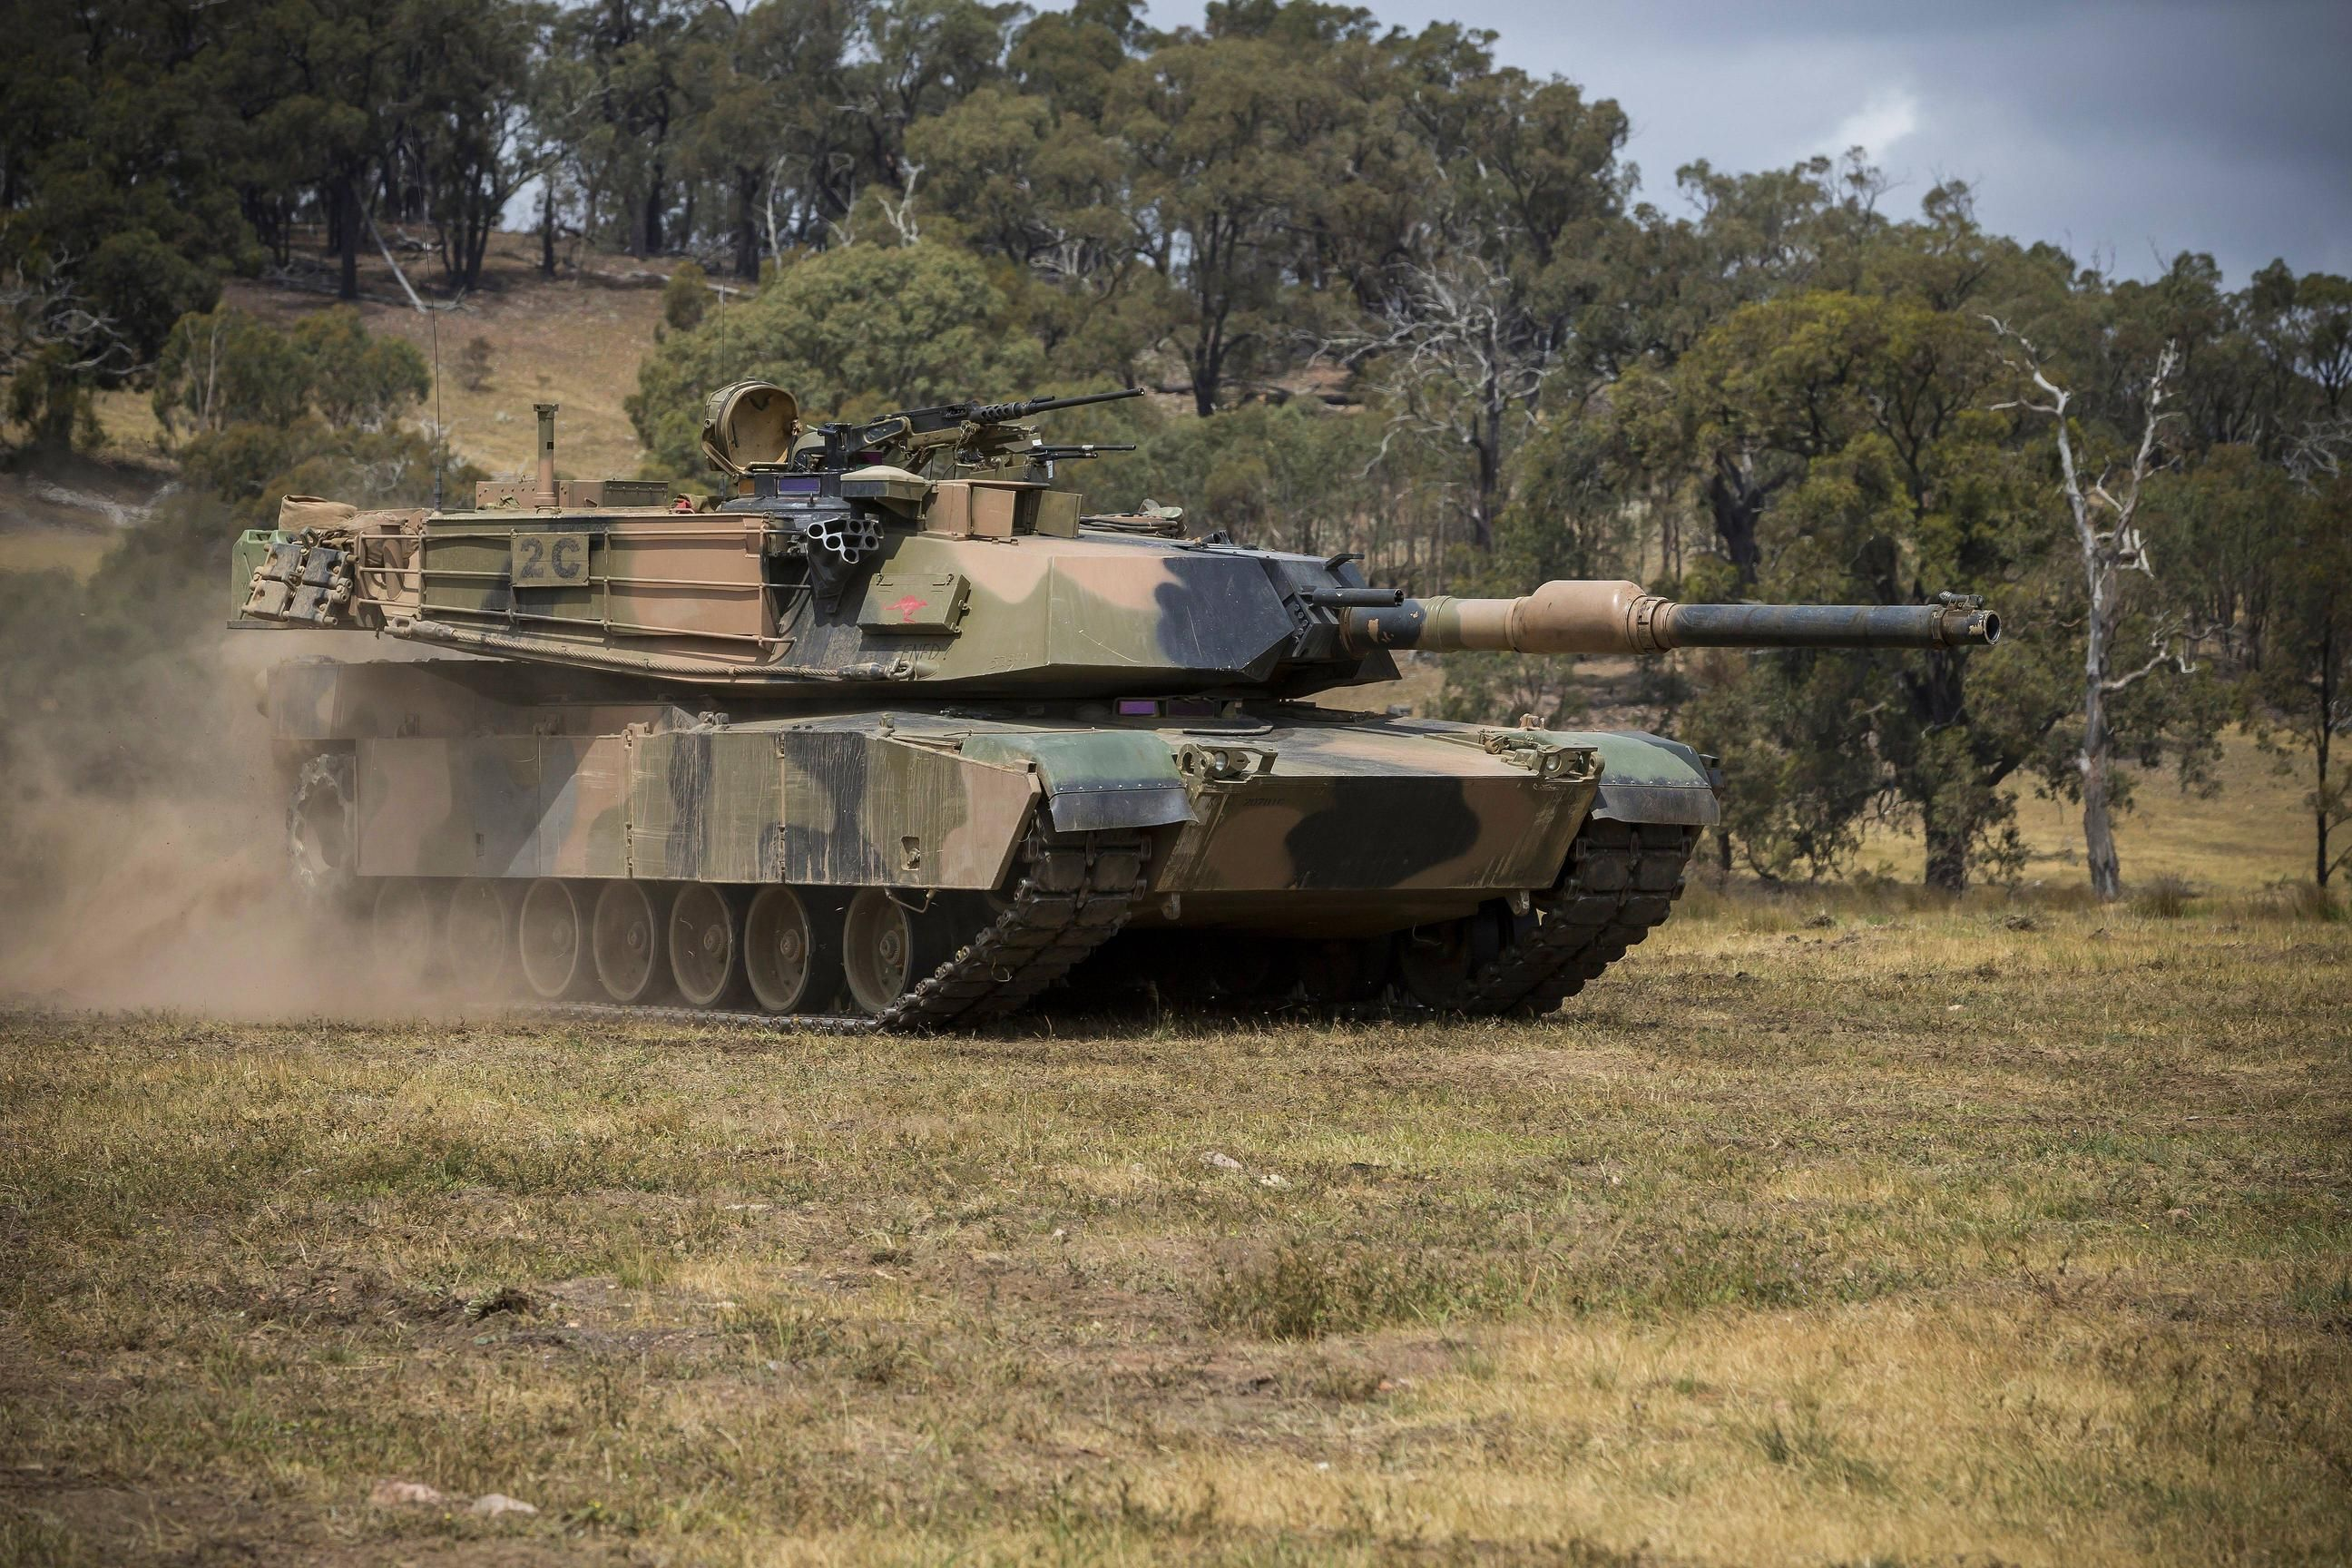 вся композиция фото танка абрамс возраст сорок